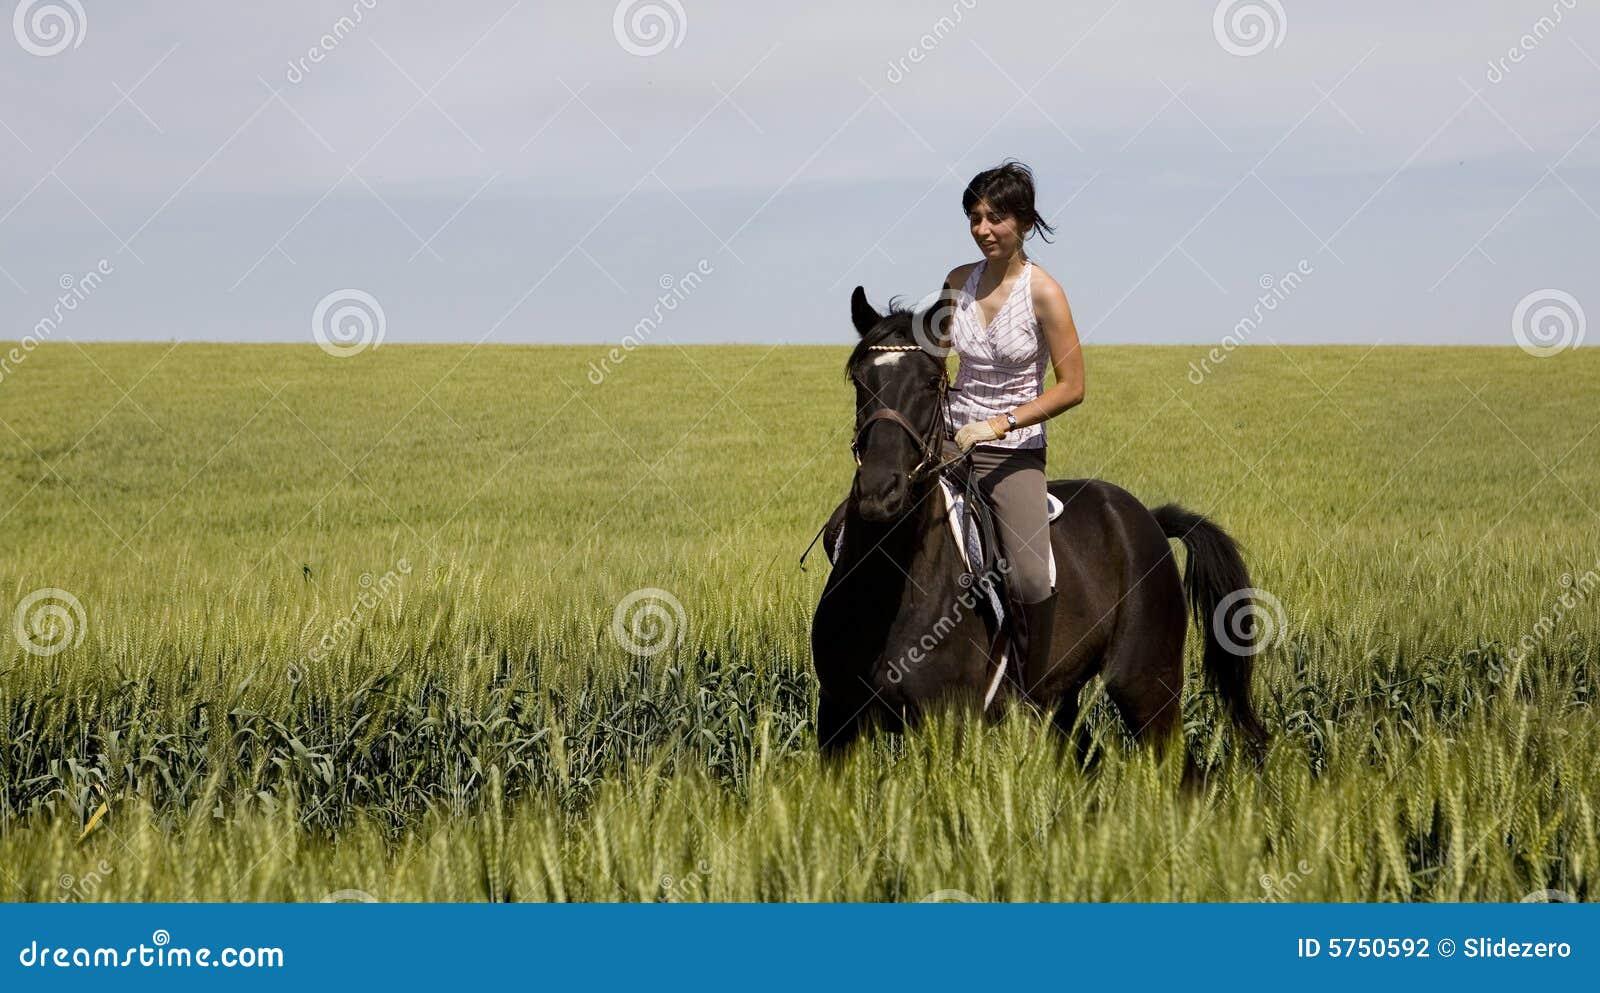 A Female Riding On A Black Horse Stock Photo Image Of Mane Exercising 5750592